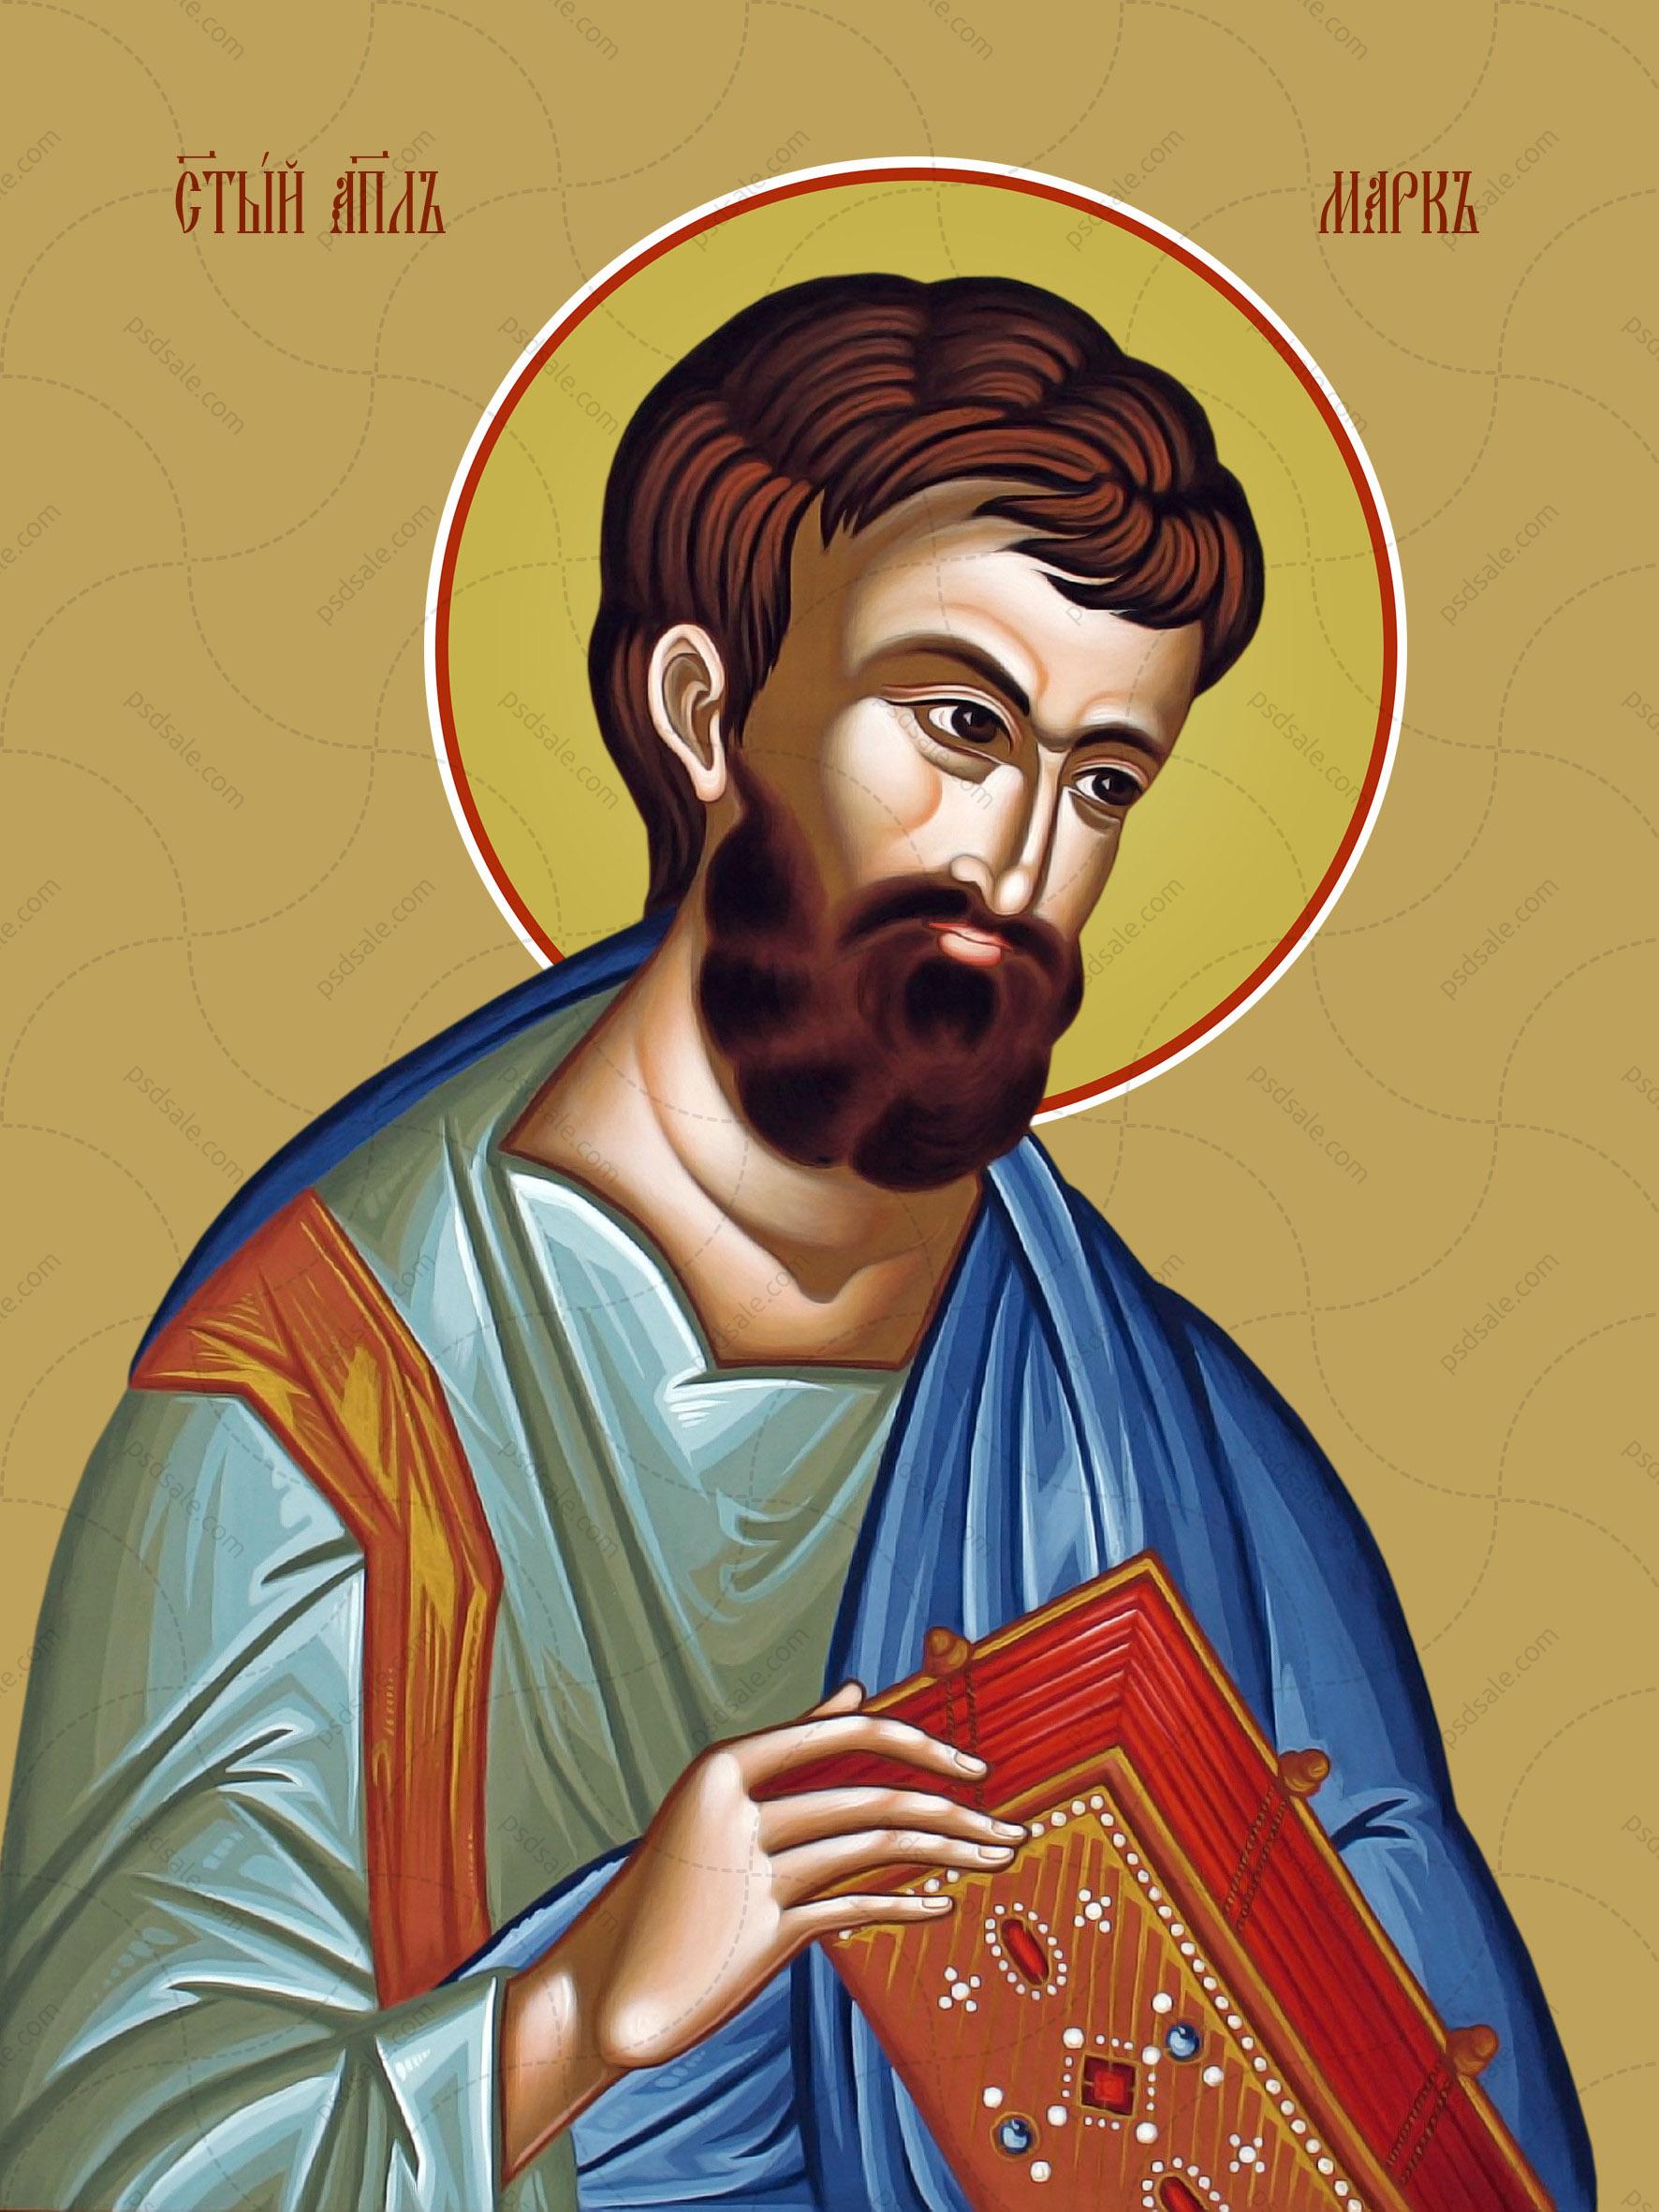 Марк, апостол